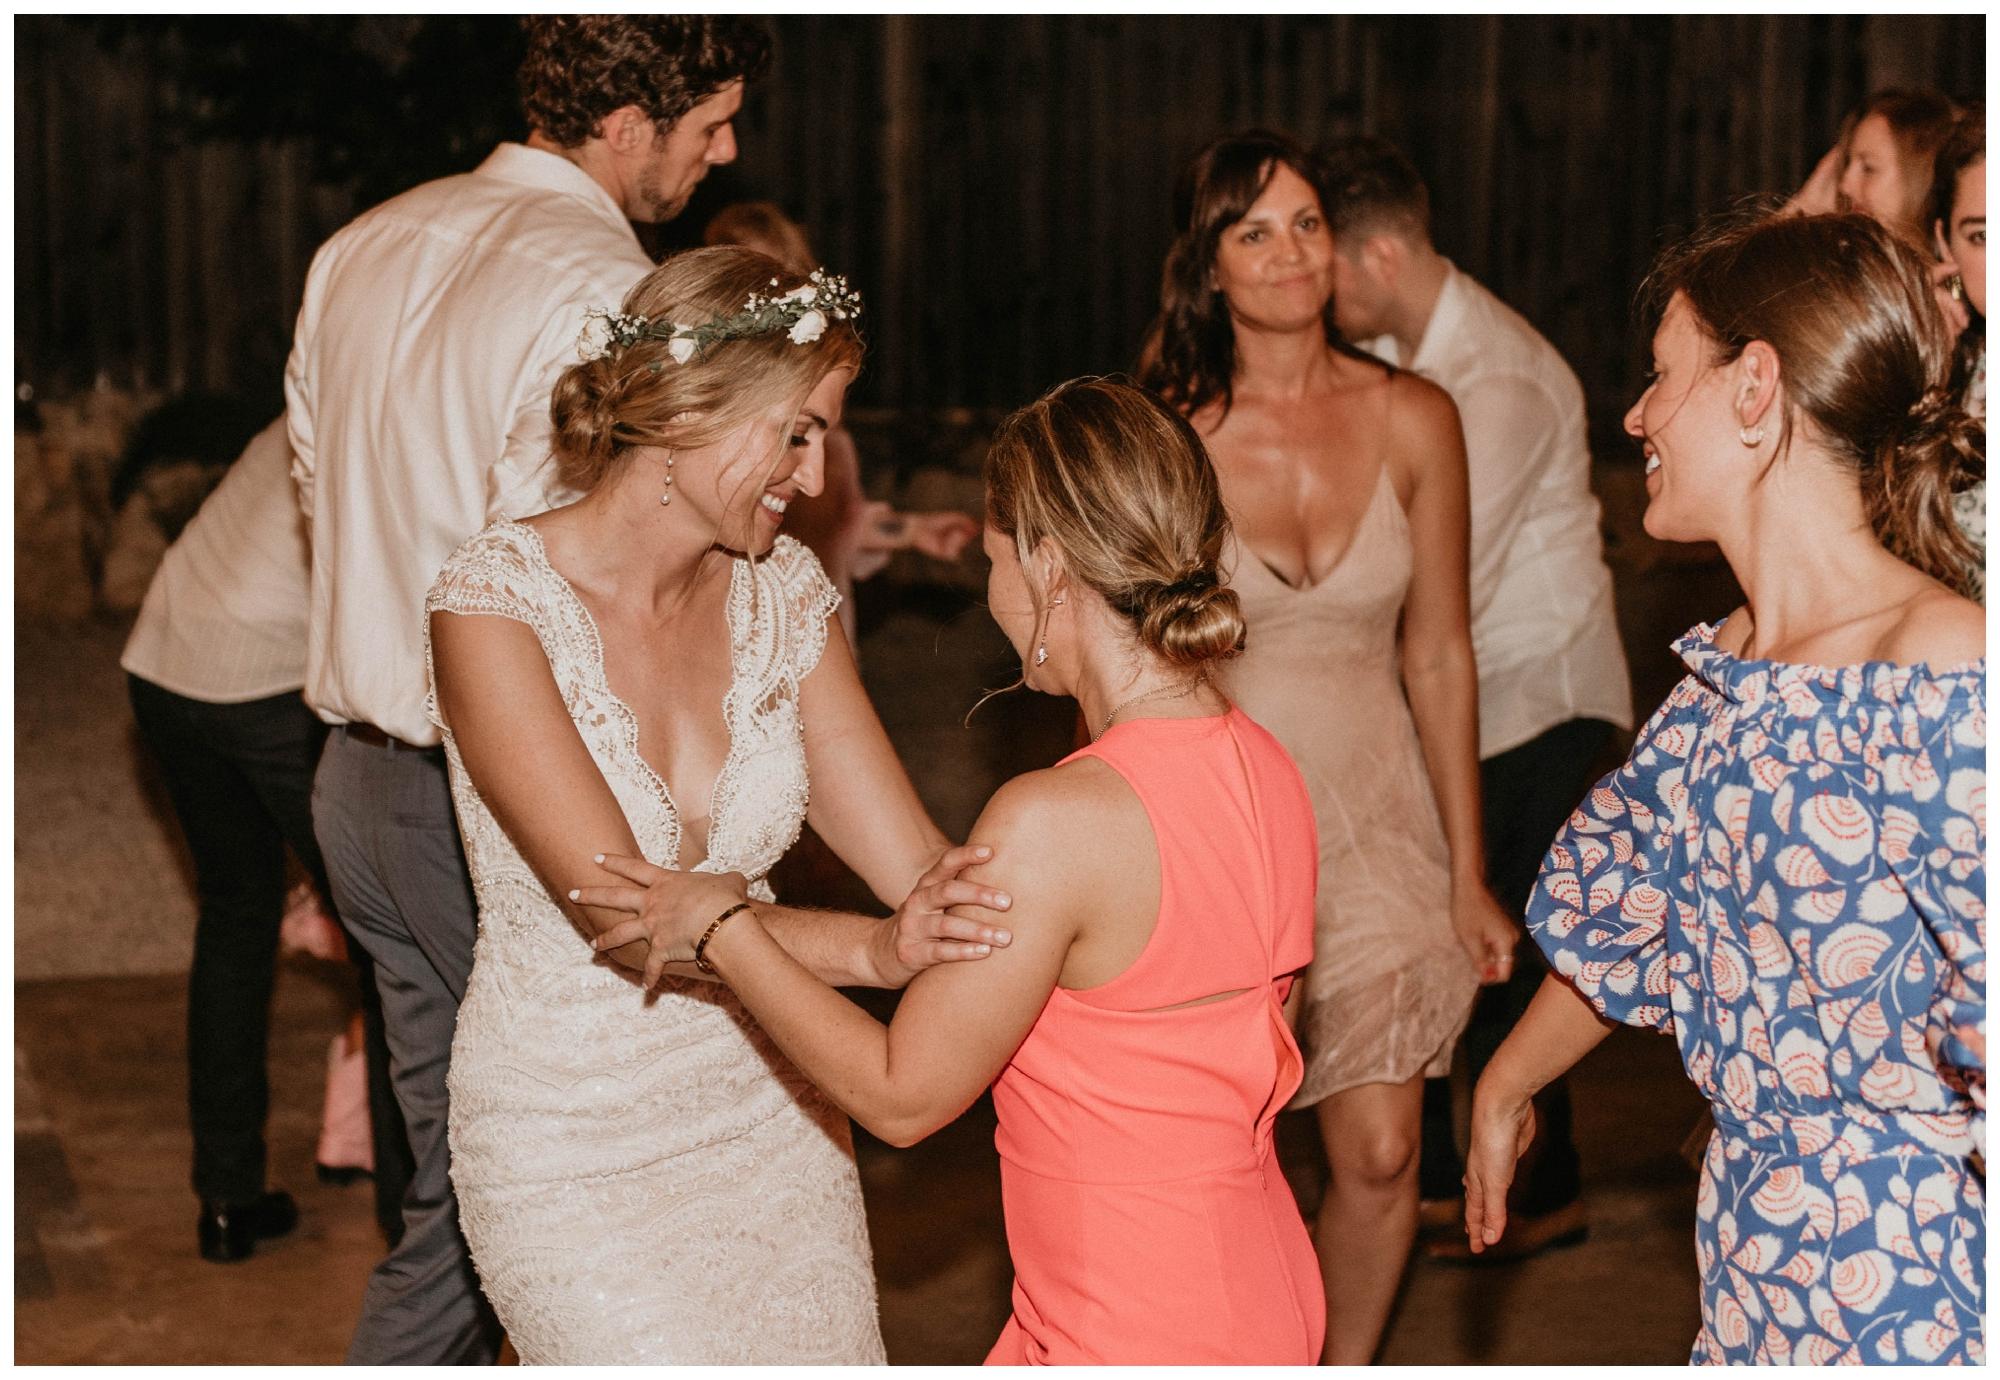 austin-texas-wedding-photography-1778-photographie_0157.jpg